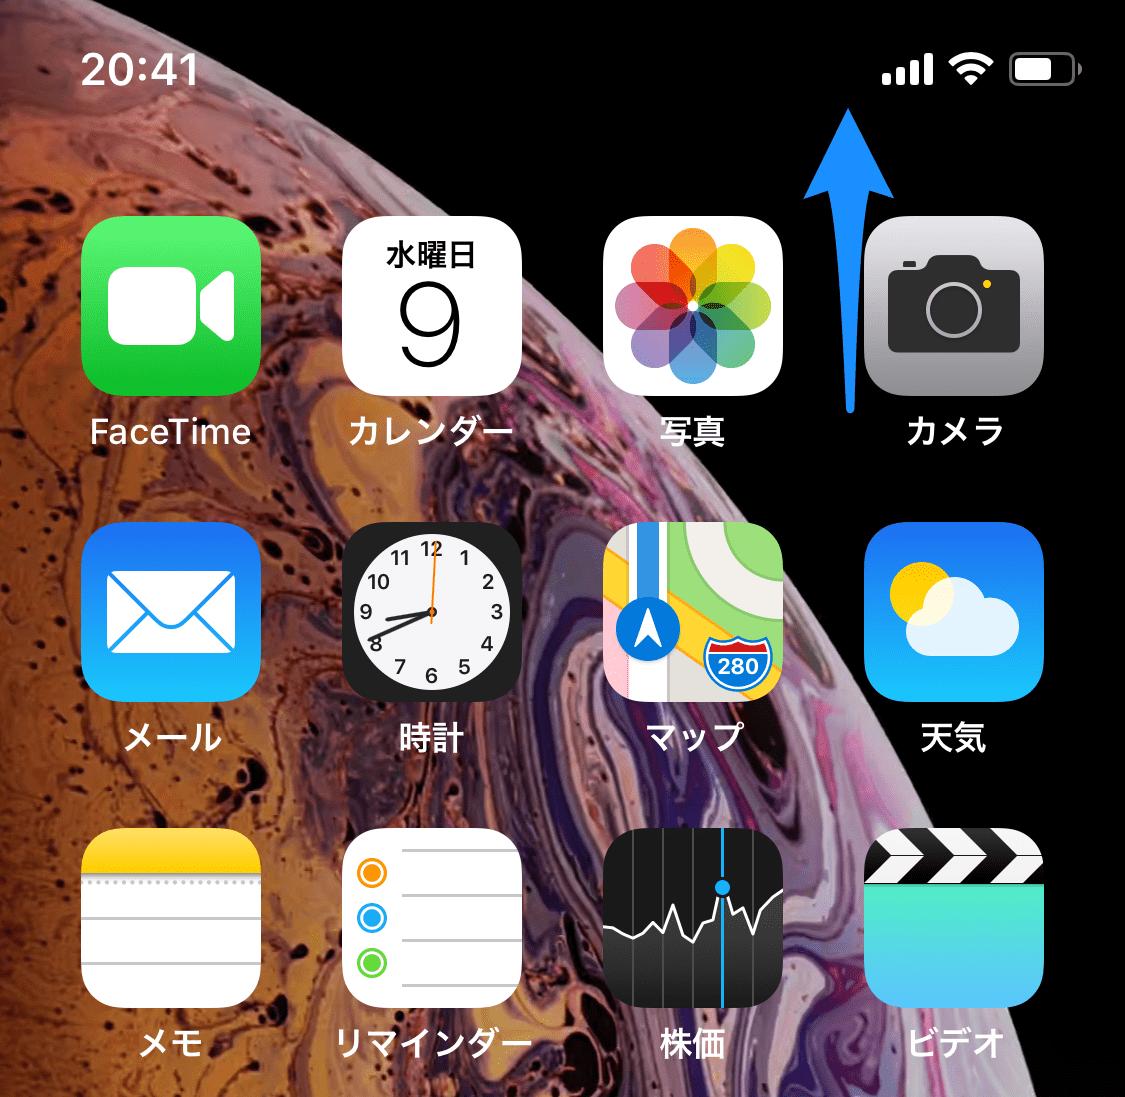 【iPhoneで困った】電話の着信音が鳴らない、バイブの振動もない!? そんな症状は「○○モード」が原因